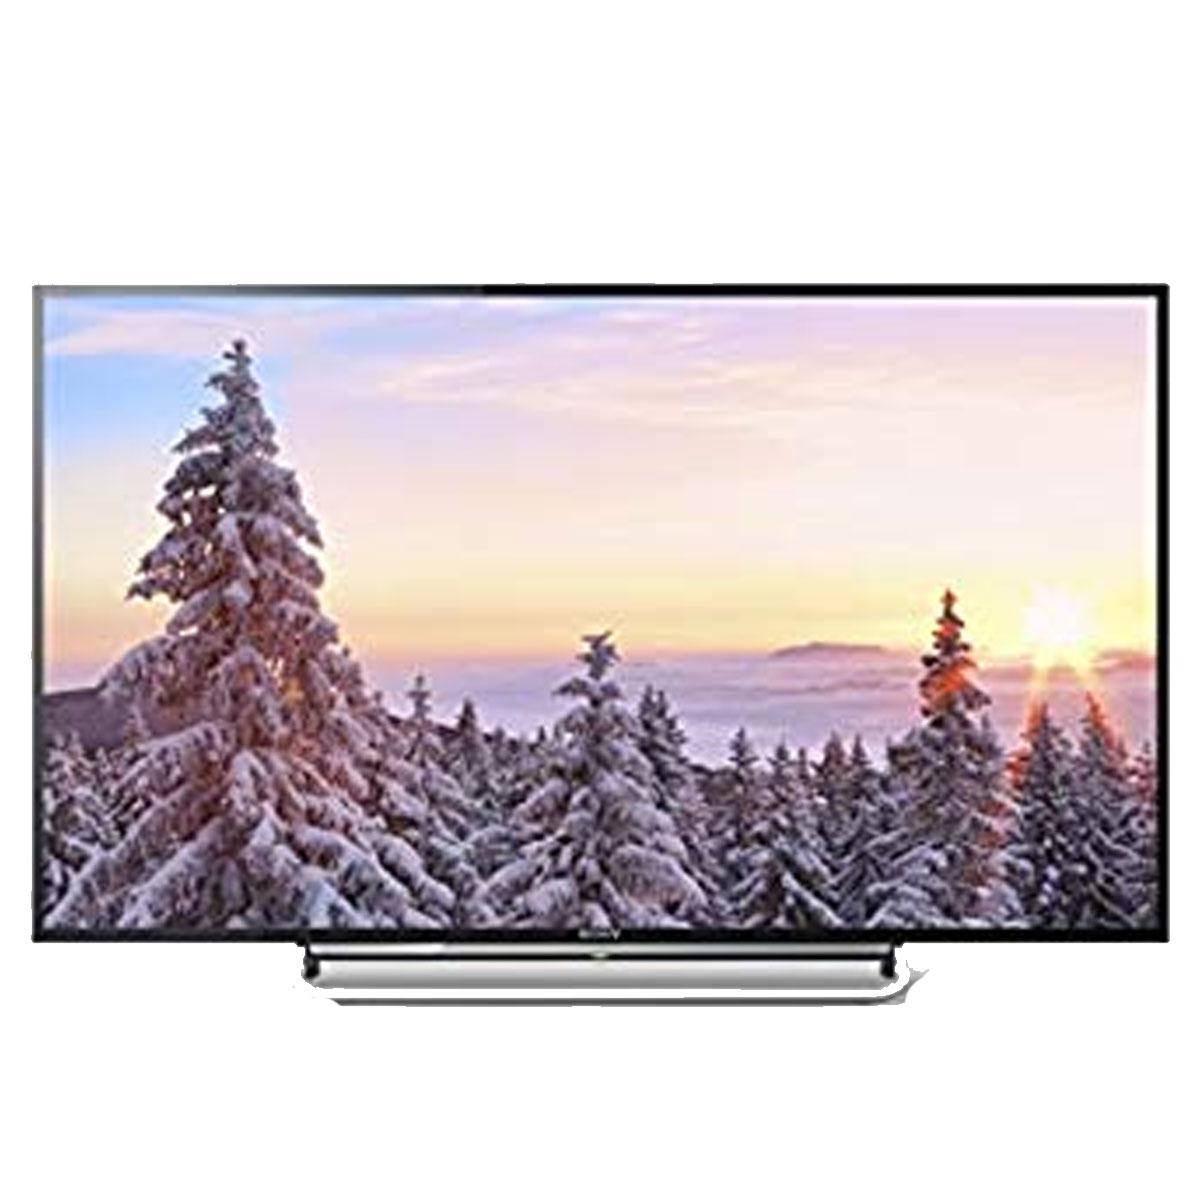 Sony 48 Inch Smart LED TV (KDL48W600B)